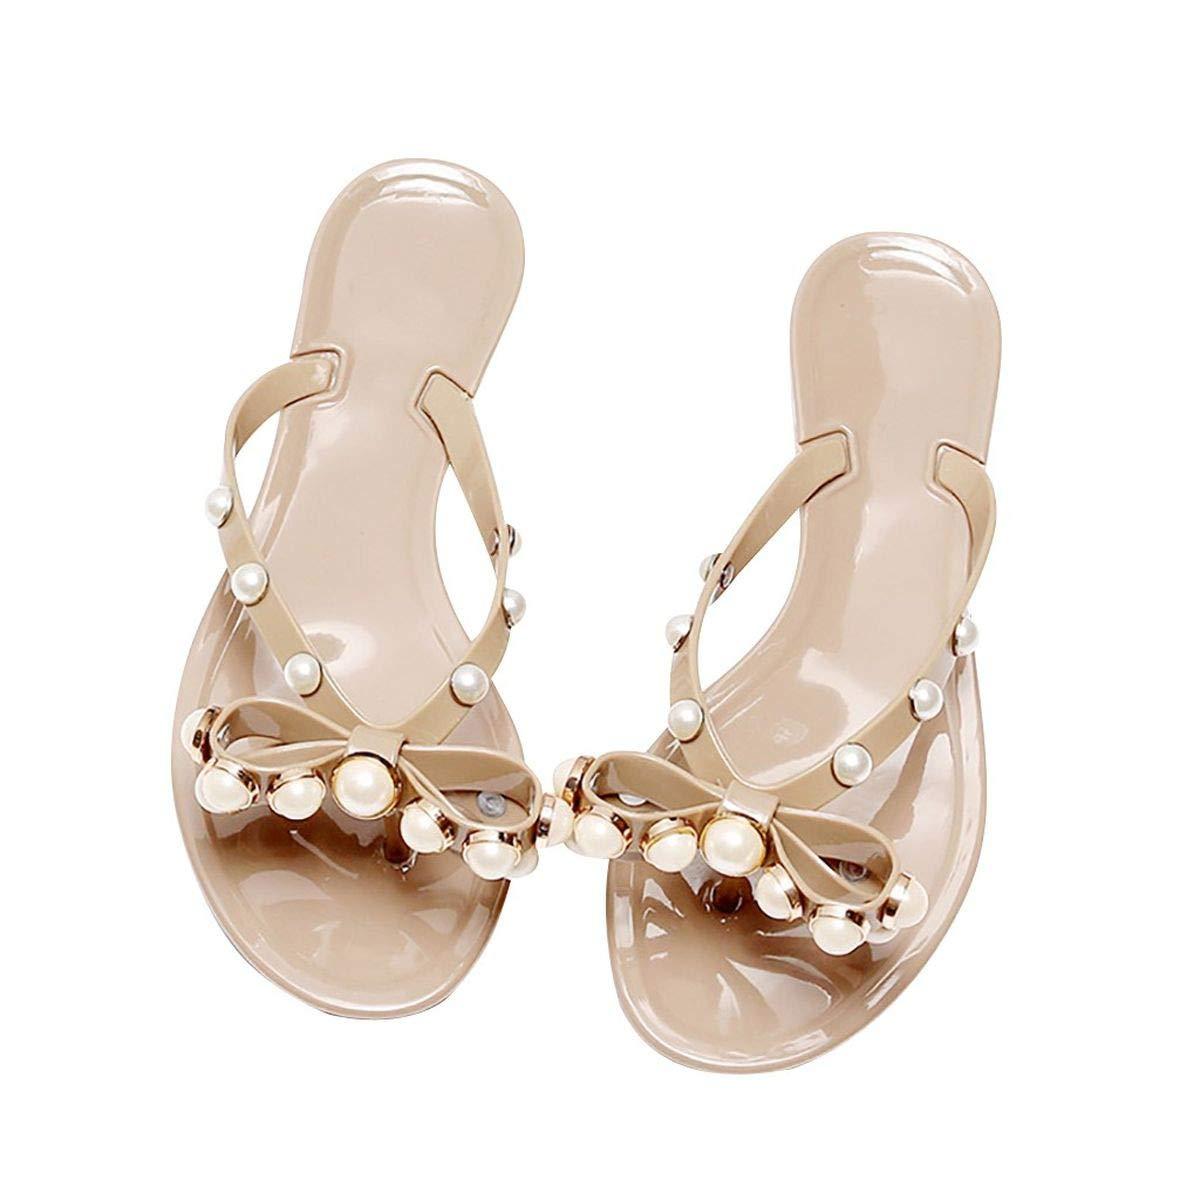 Womens Rivets Bowtie Flip Flops Jelly Thong Sandal Pearl Rubber Flat Summer Beach Rain Shoes (Khaki, 8) by Meiliwanju